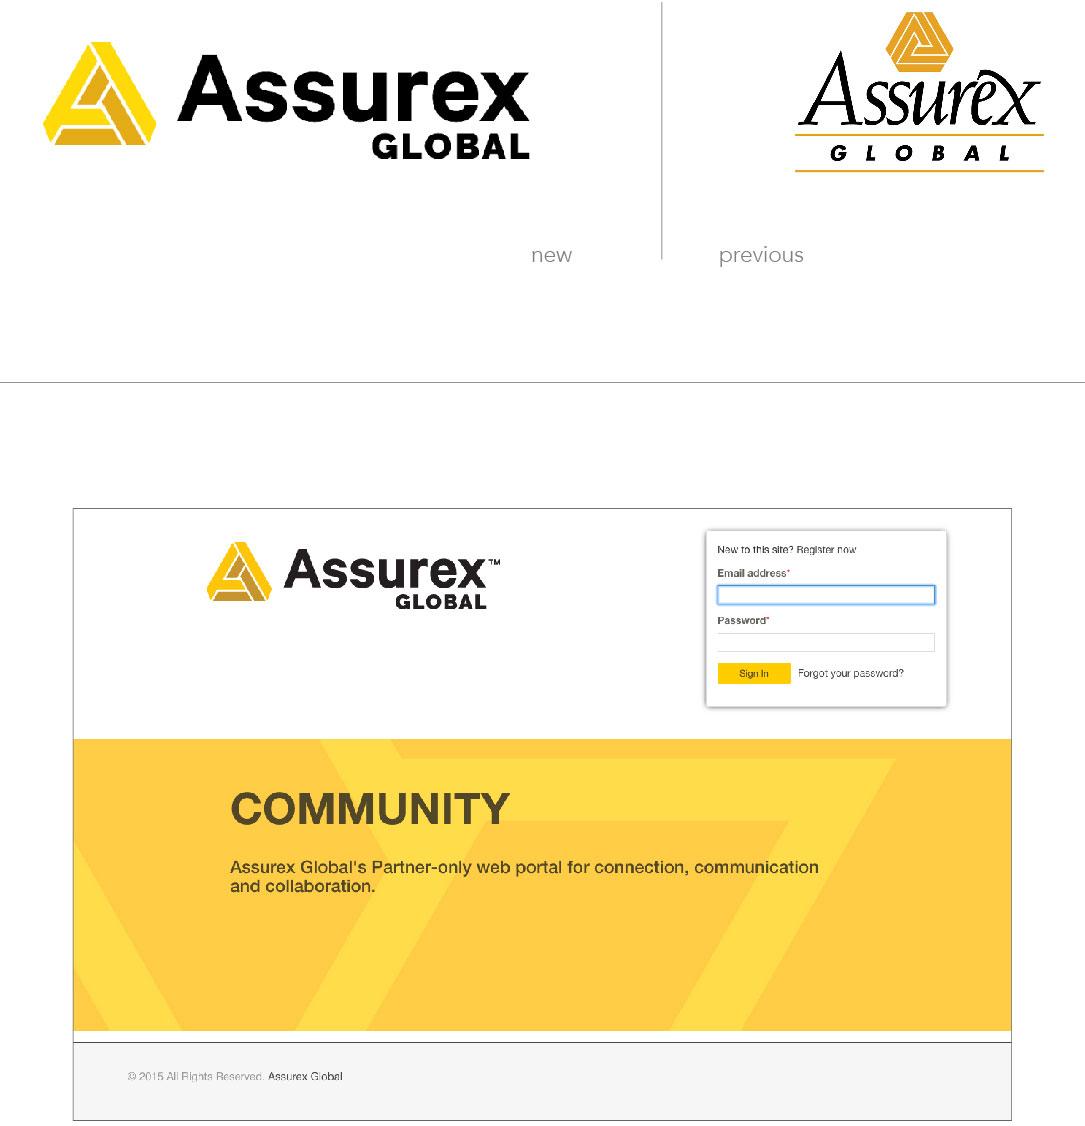 Assurex_Online Presence.jpg